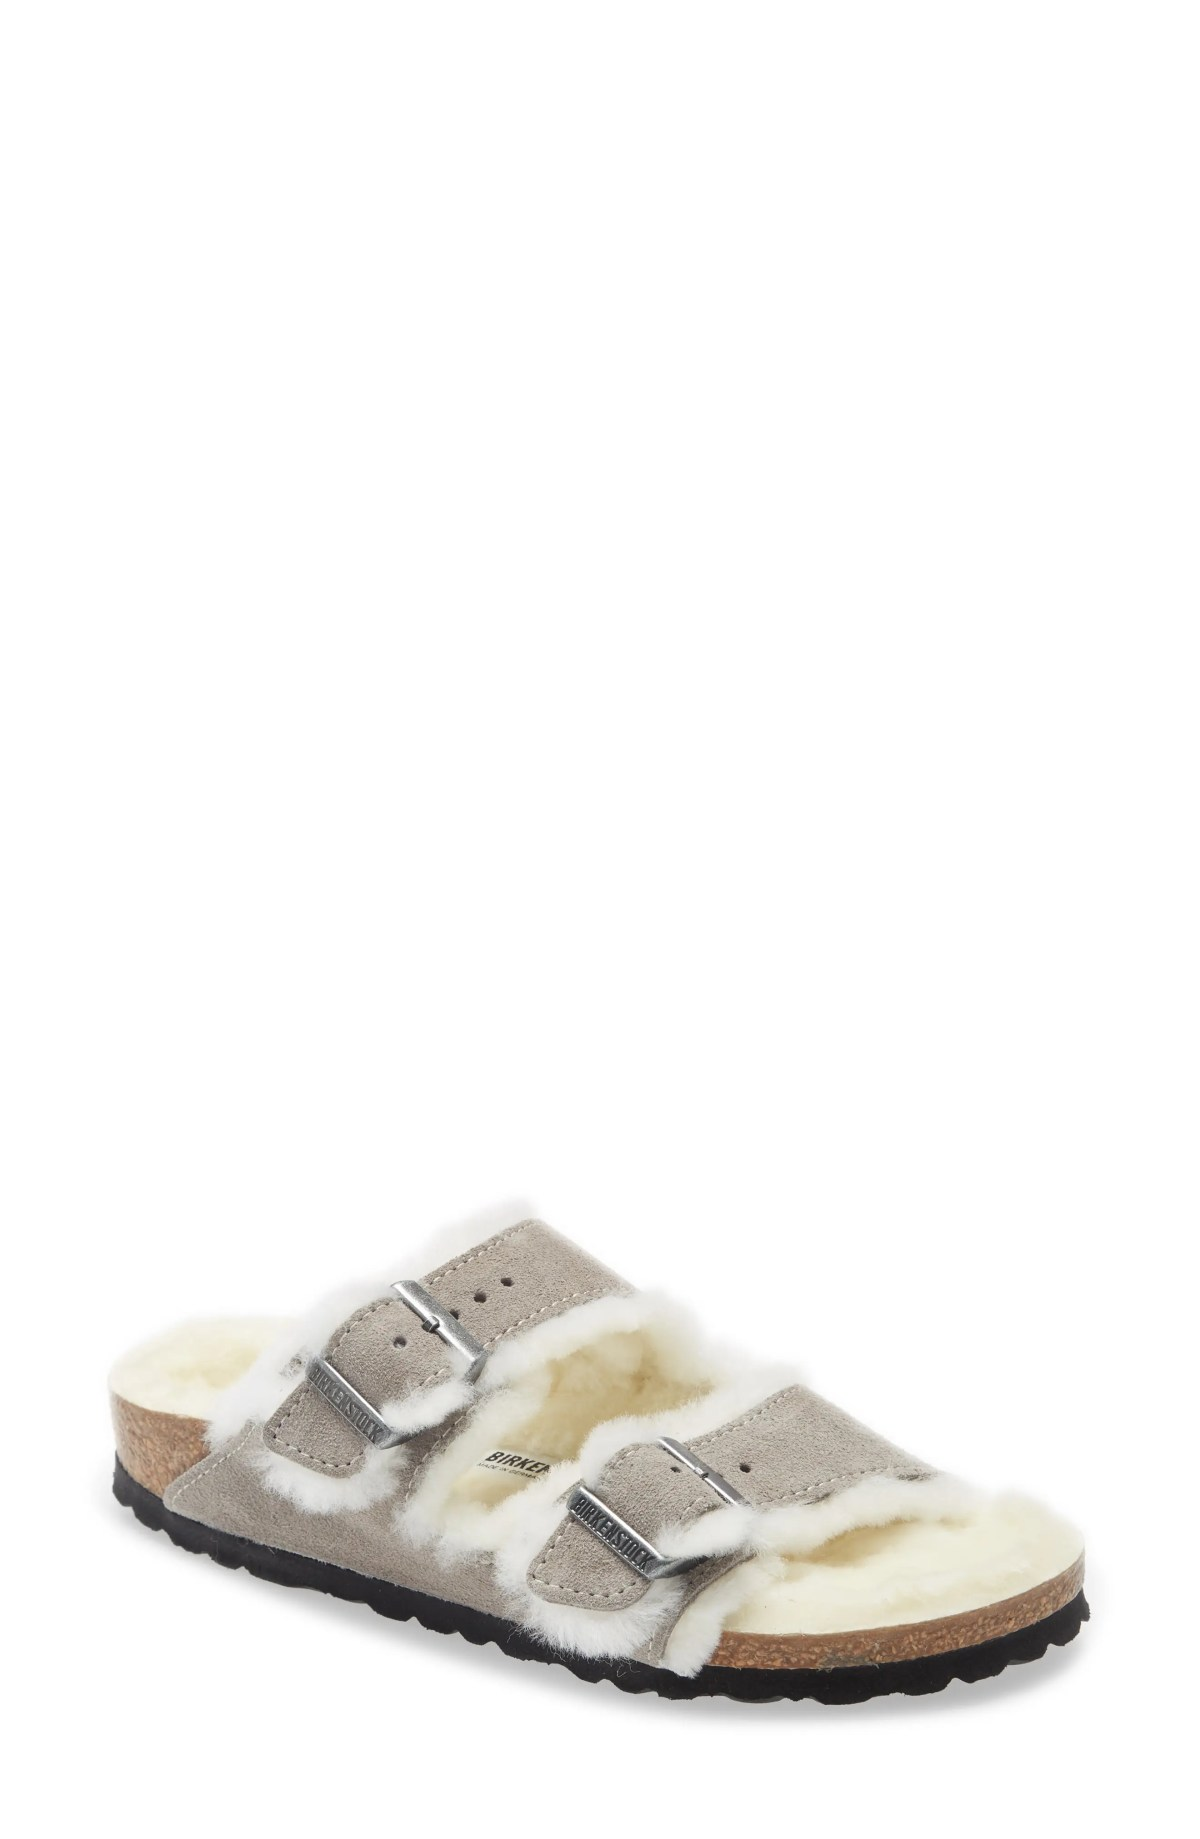 BIRKENSTOCK Arizona Genuine Shearling Slide Sandal, Main, color, STONE COIN SUEDE